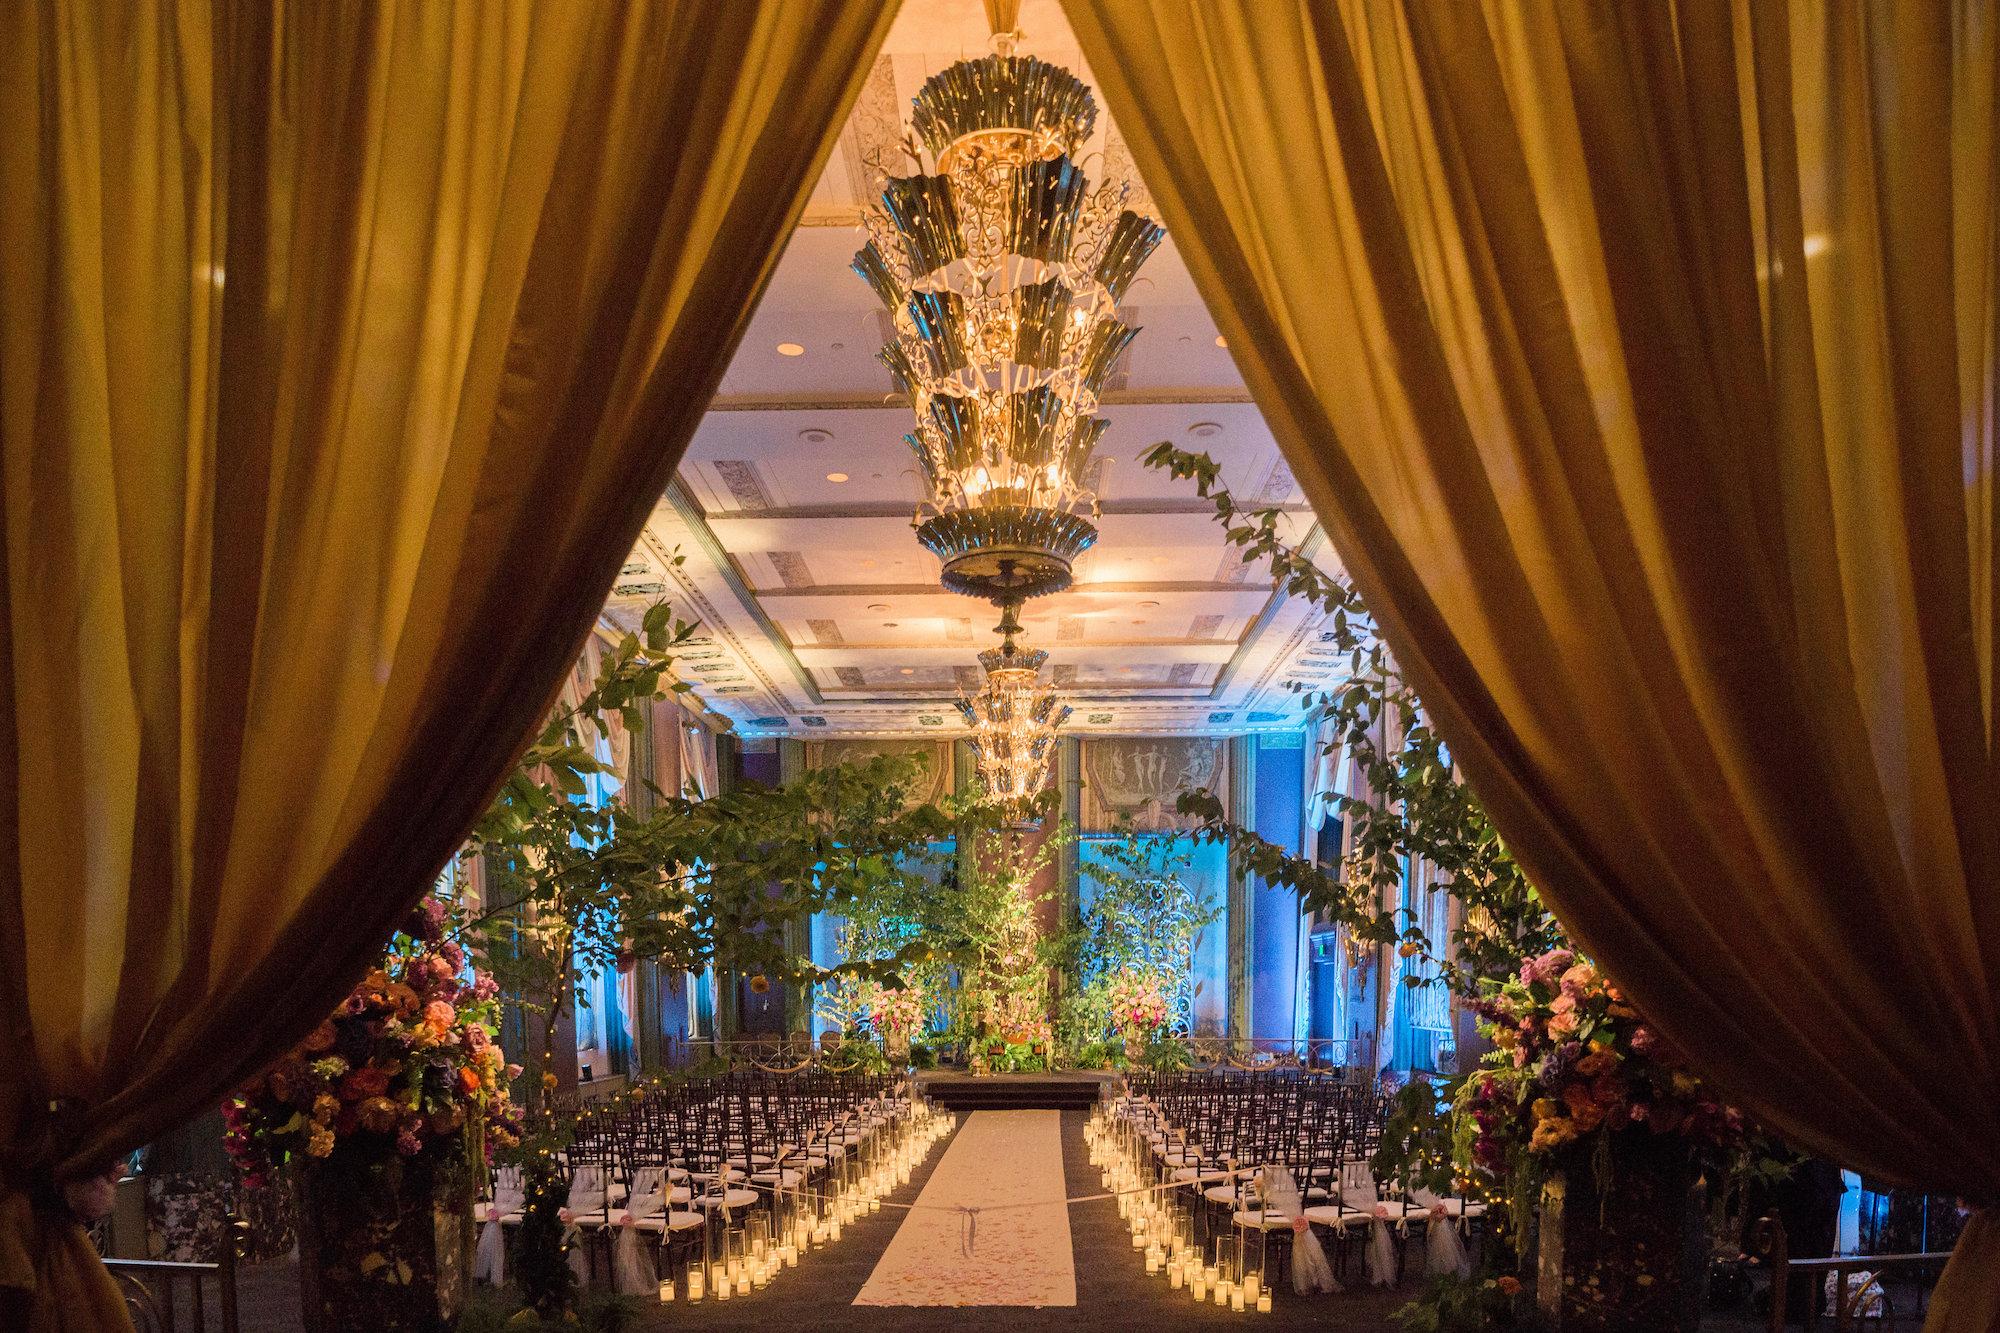 Ceremony at The Hilton Netherland Plaza Hotel Cincinnati, OH